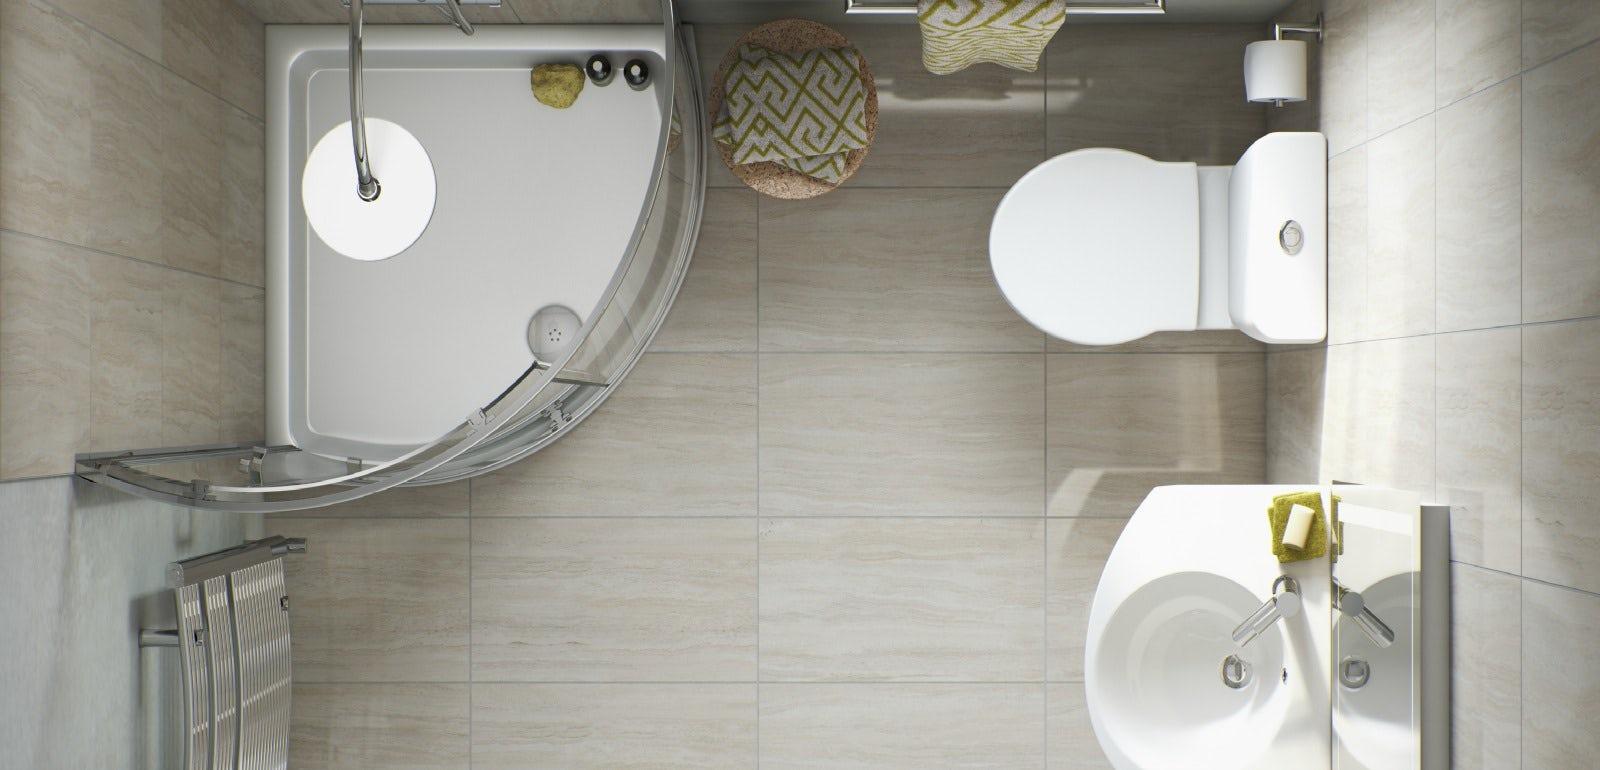 Bathroom Layout Measurement Advice